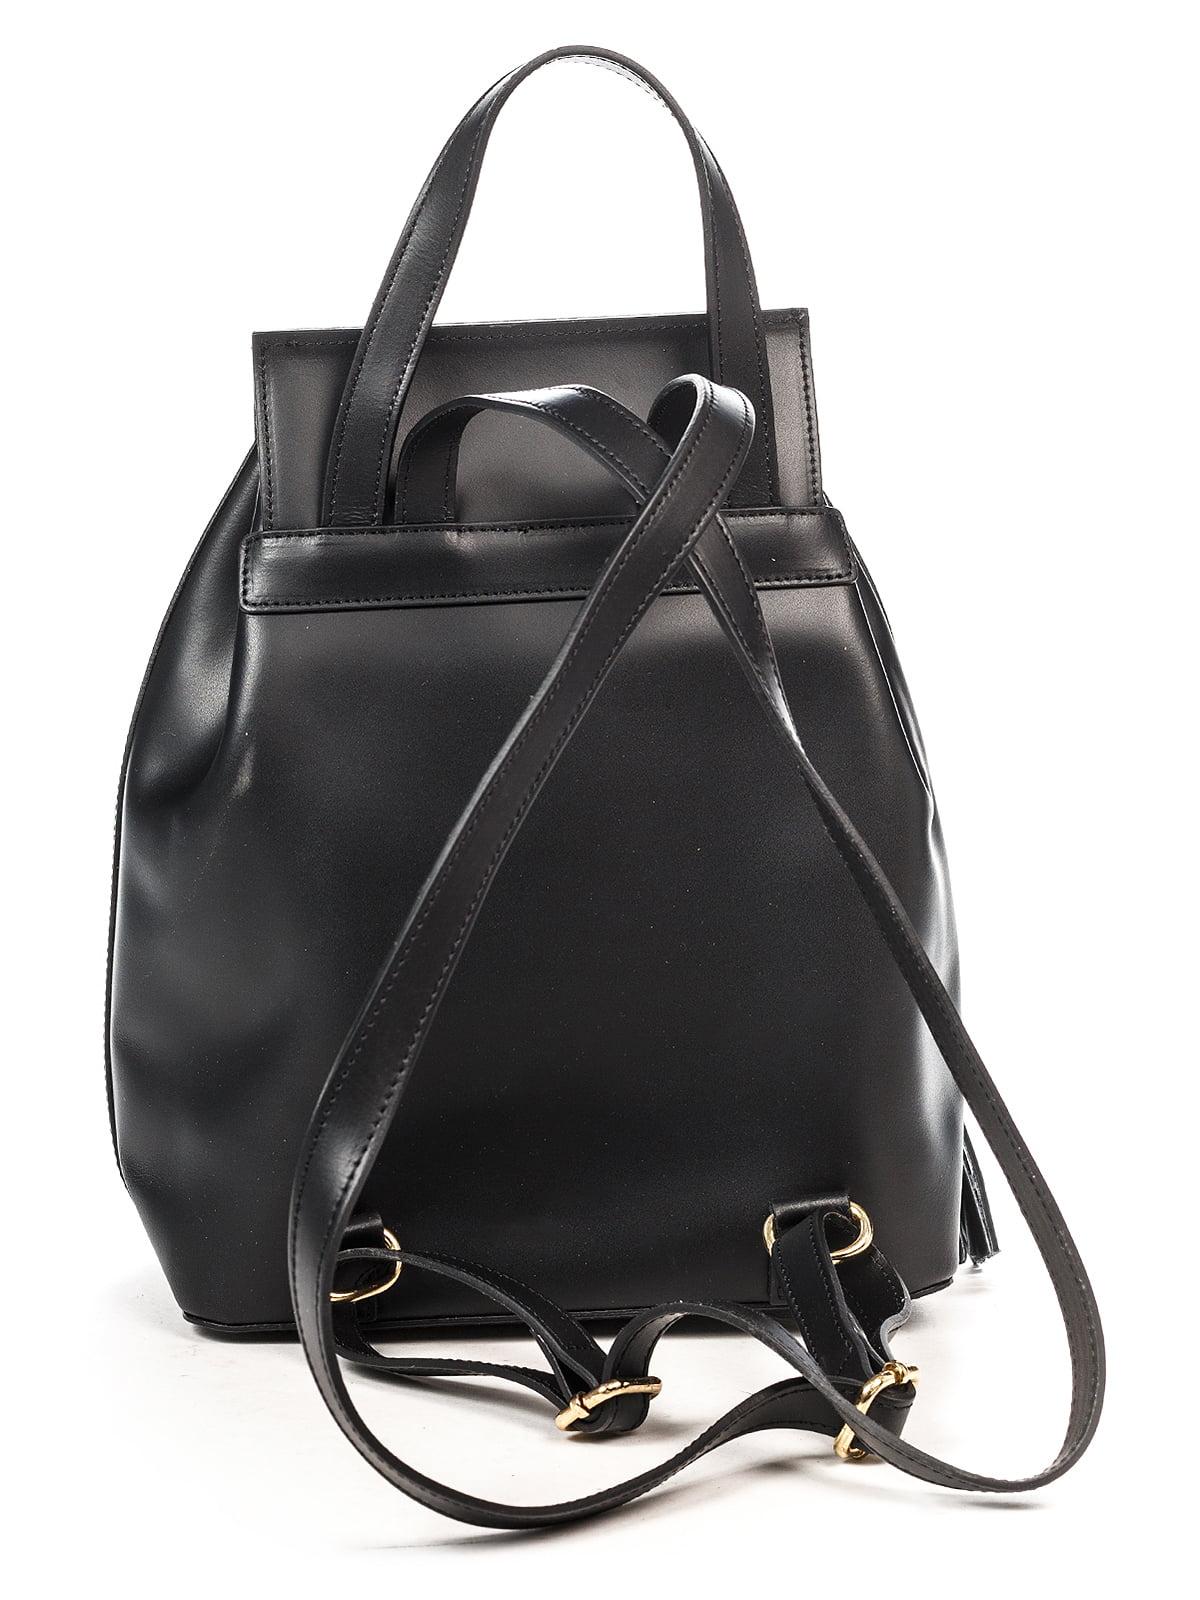 Рюкзак чорний | 4979548 | фото 2